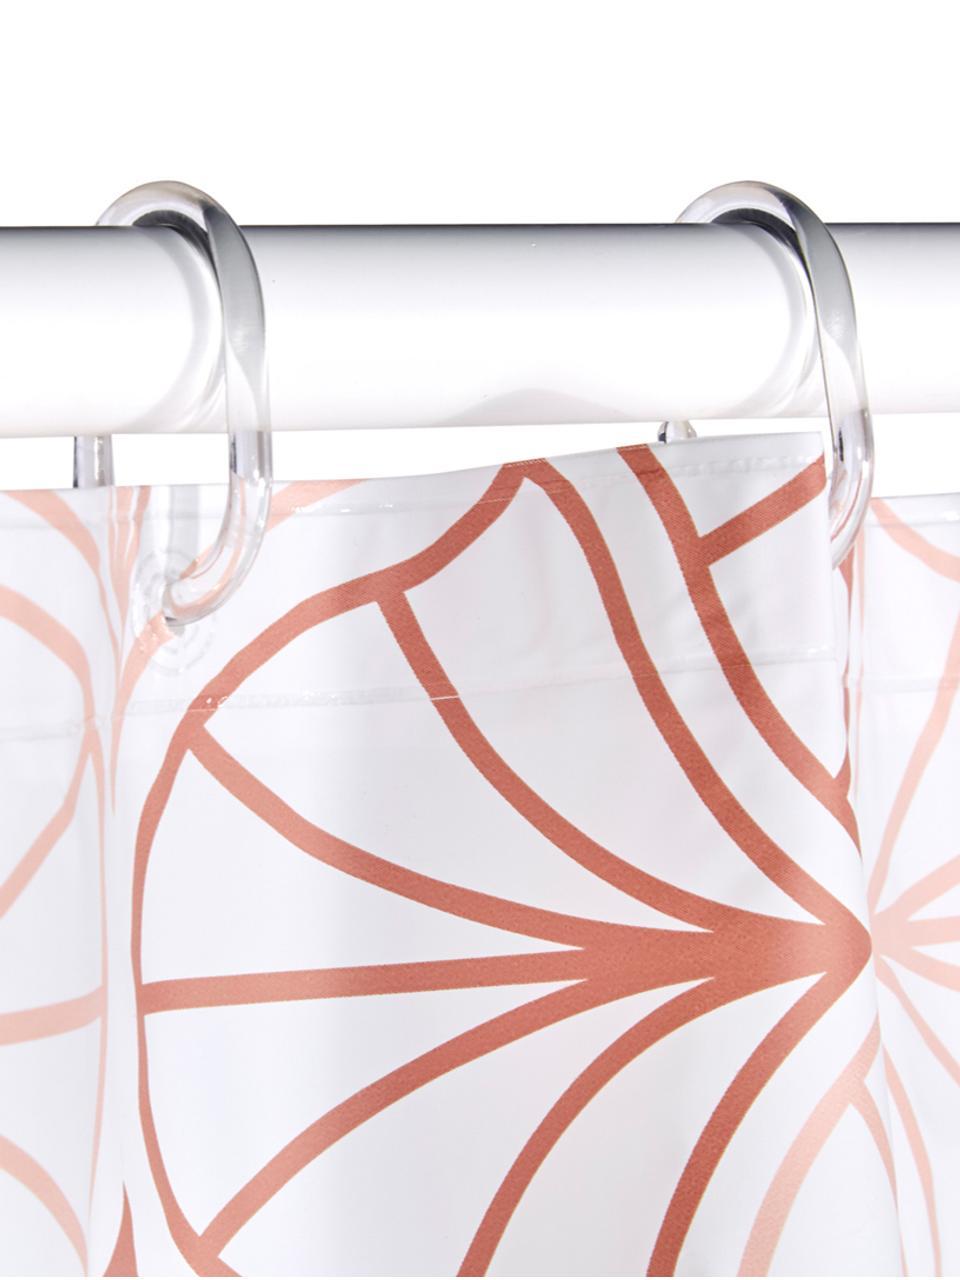 Tenda da doccia Bloom, Eco-plastica (PEVA), privo di PVC, Bianco, terracotta, Larg. 180 x Lung. 200 cm